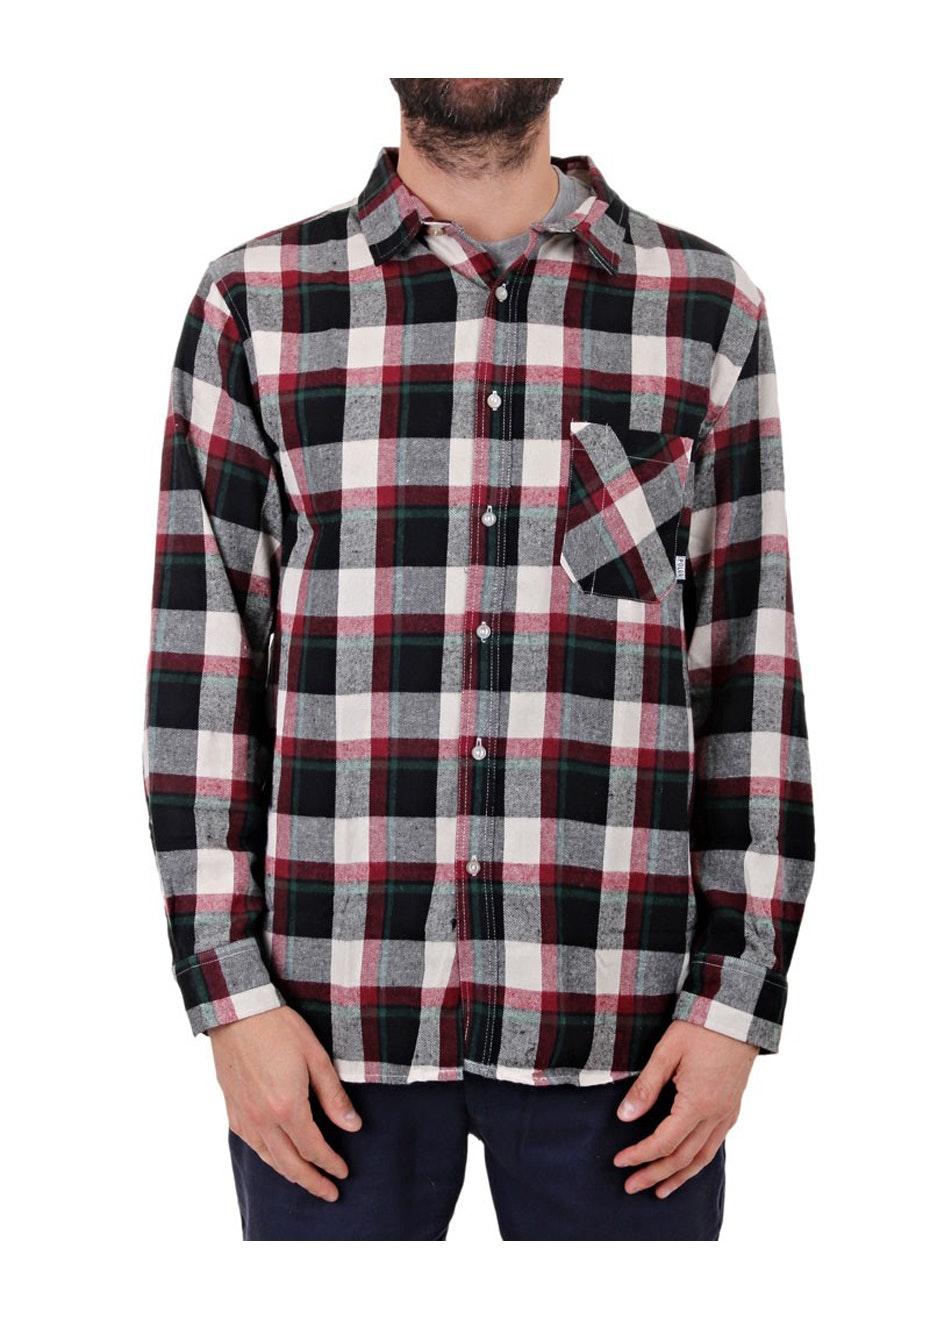 Poler - Long Sleeve Button Up Shirt - Black Plaid